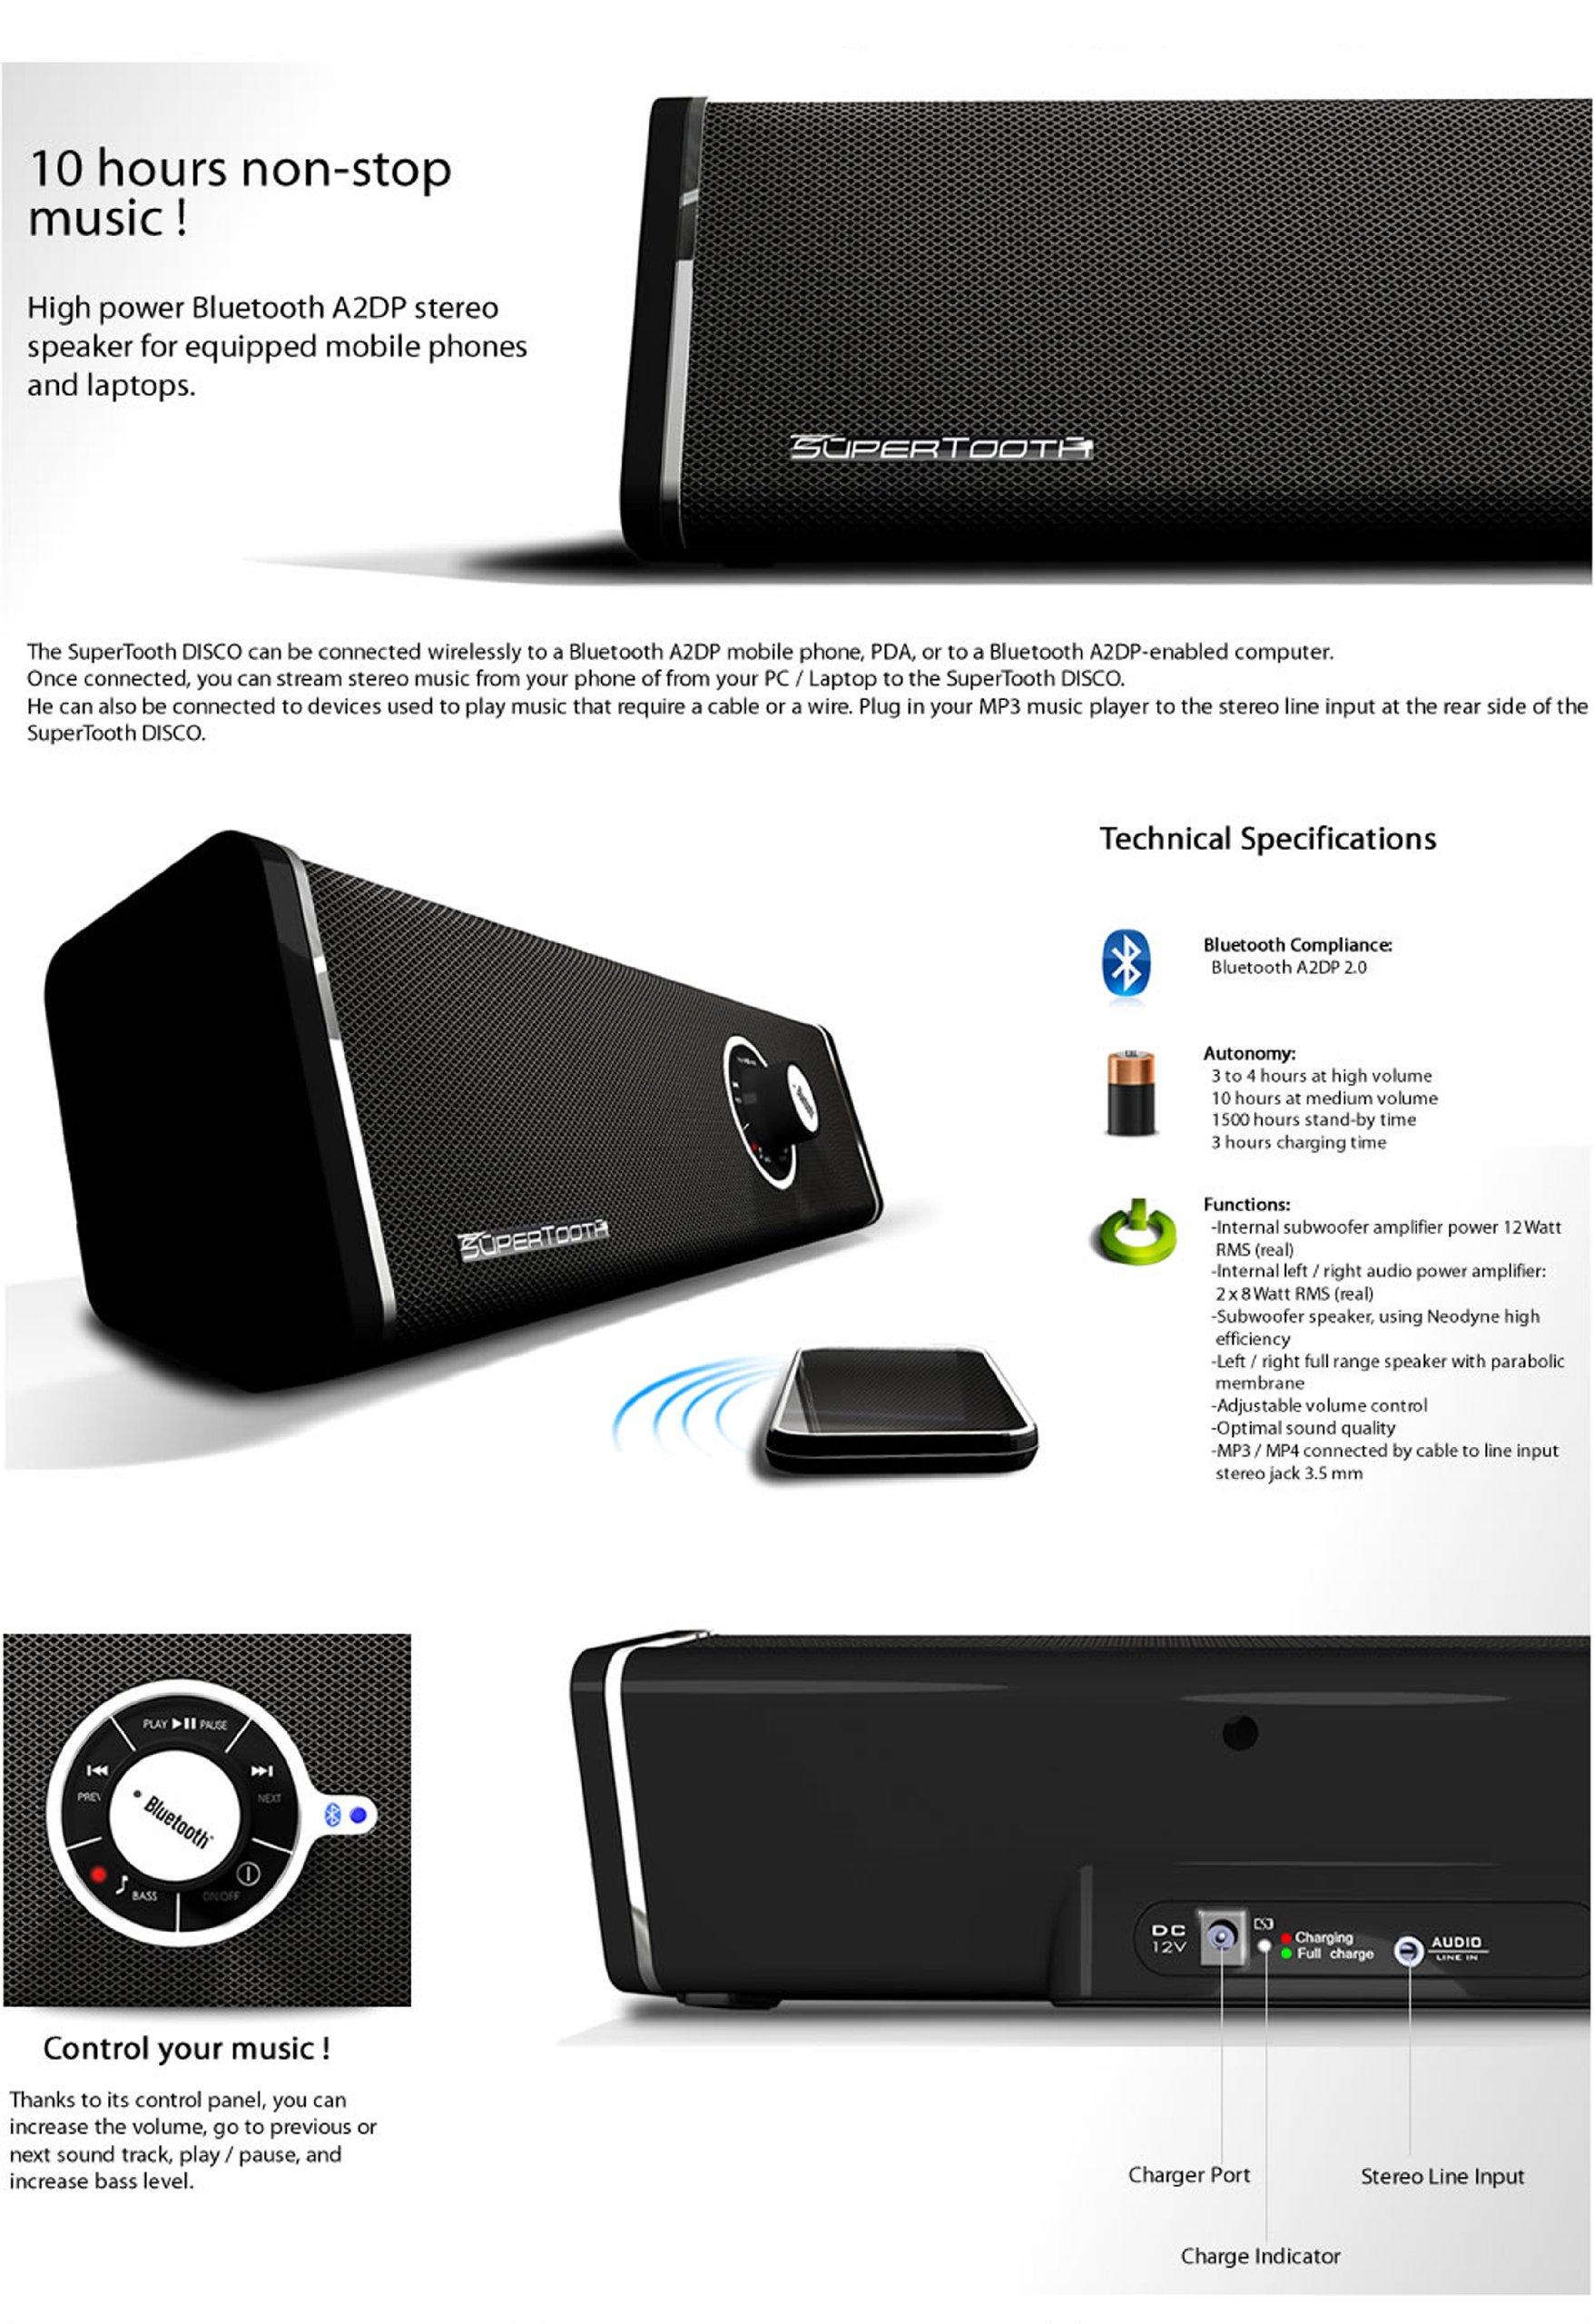 Travel Leatherette Sleeve For Samsung Galaxy Tab S 10.5 / Galaxy Tab 4 10.1 / Galaxy Tab Pro 10.1 + Bluetooth Speaker by VangoddyCase (Image #7)